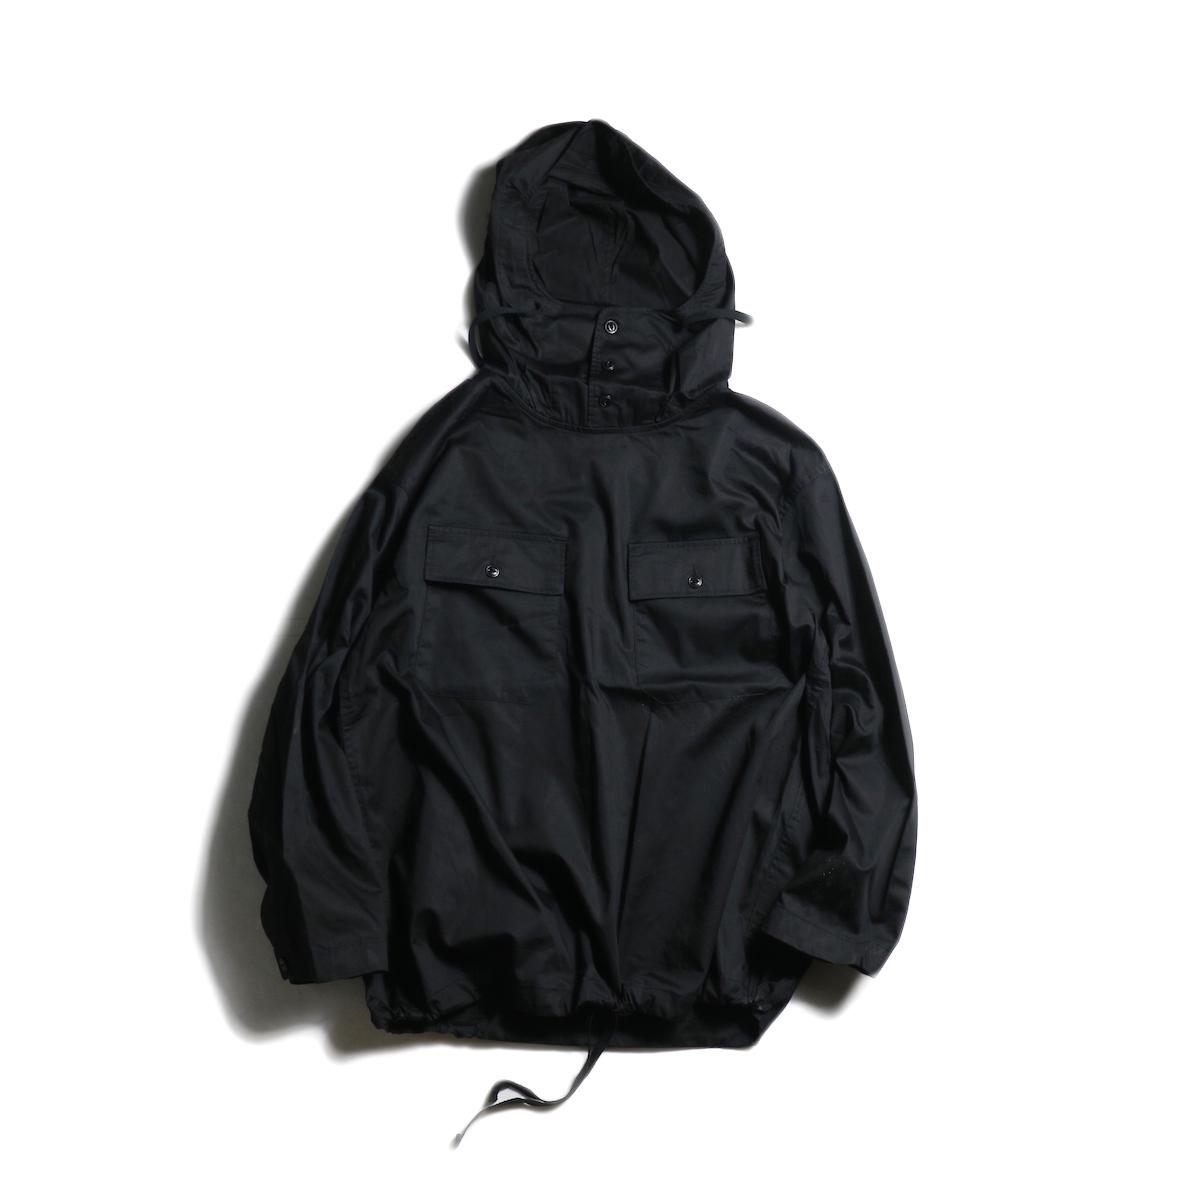 Engineered Garments / Cagoule Shirt -Cotton Nano Twill (Black)